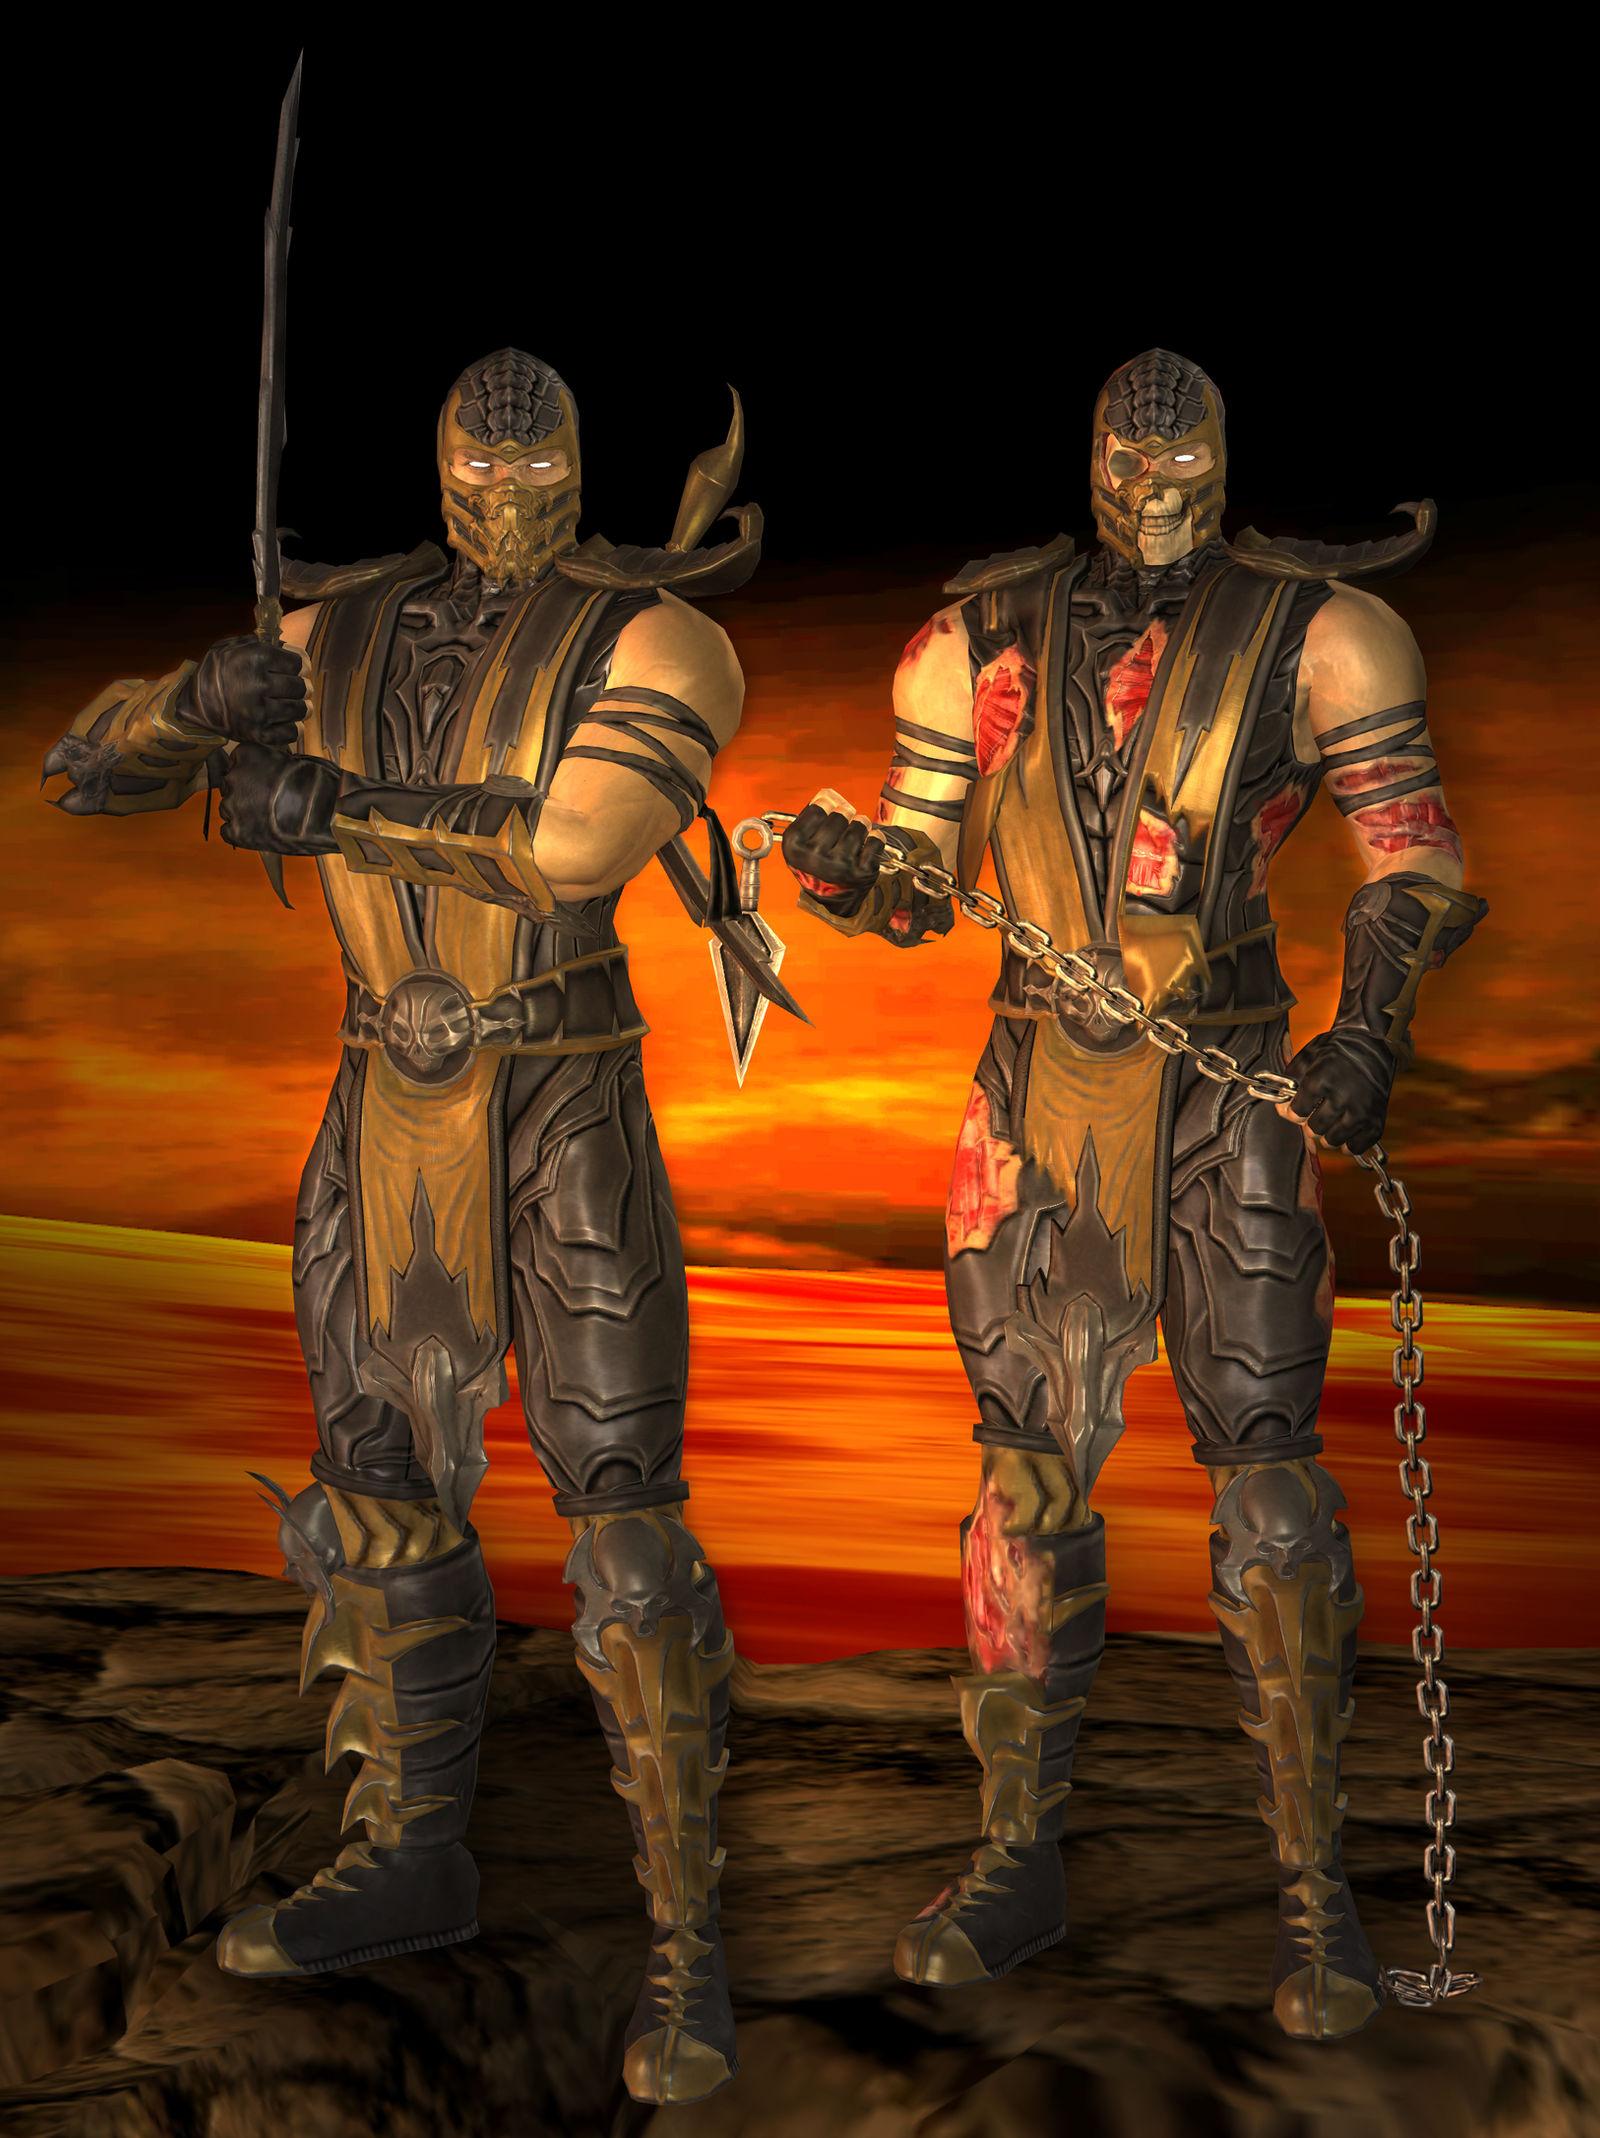 Scorpion Primary Mortal Kombat 9 By Romero1718 On Deviantart